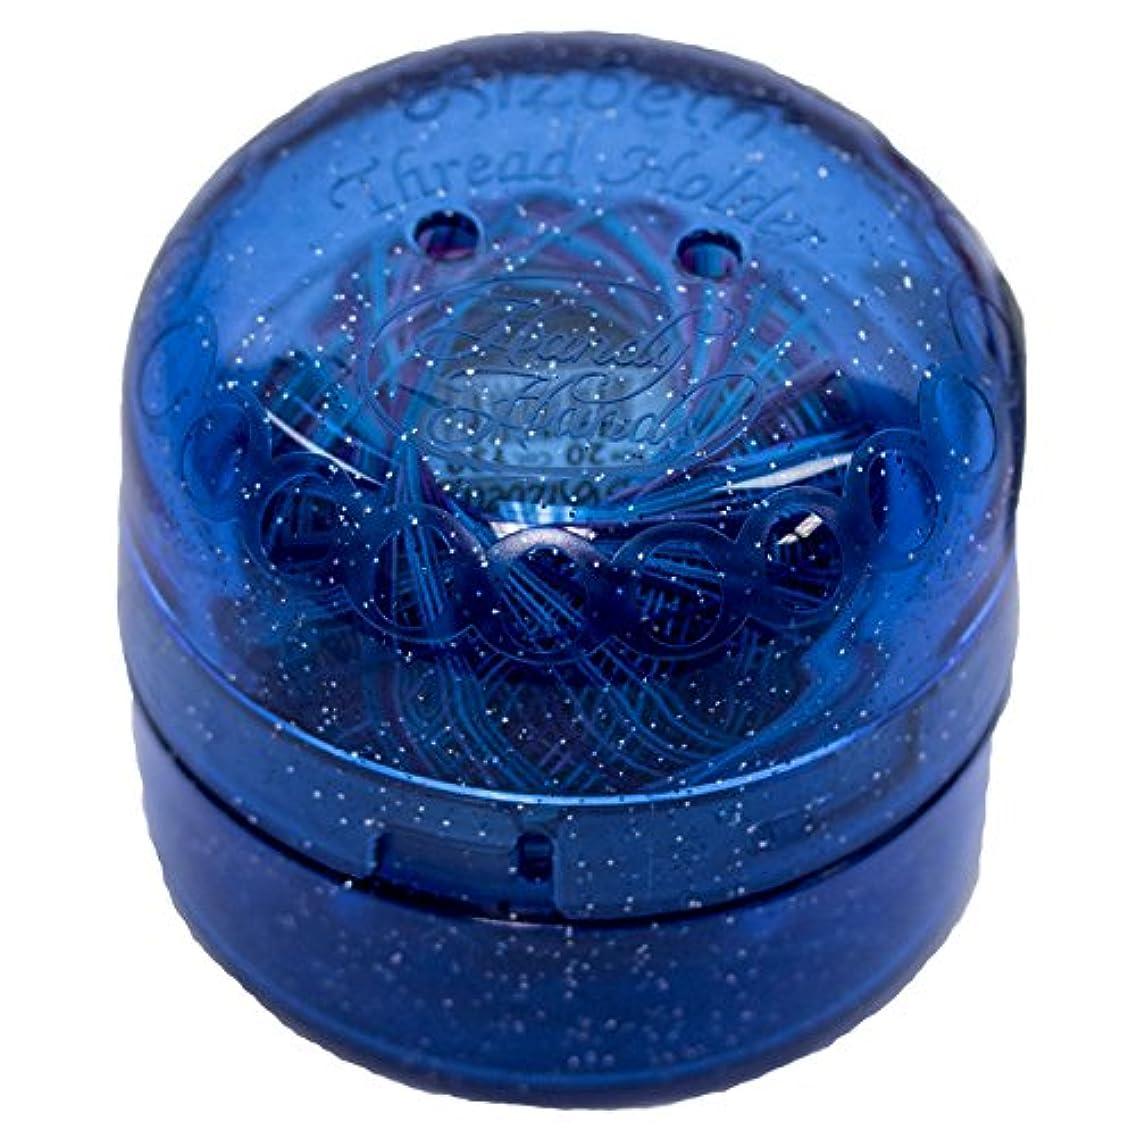 Handy Hands HH5070 Lizbeth Thread Holder, Sparkle Blue